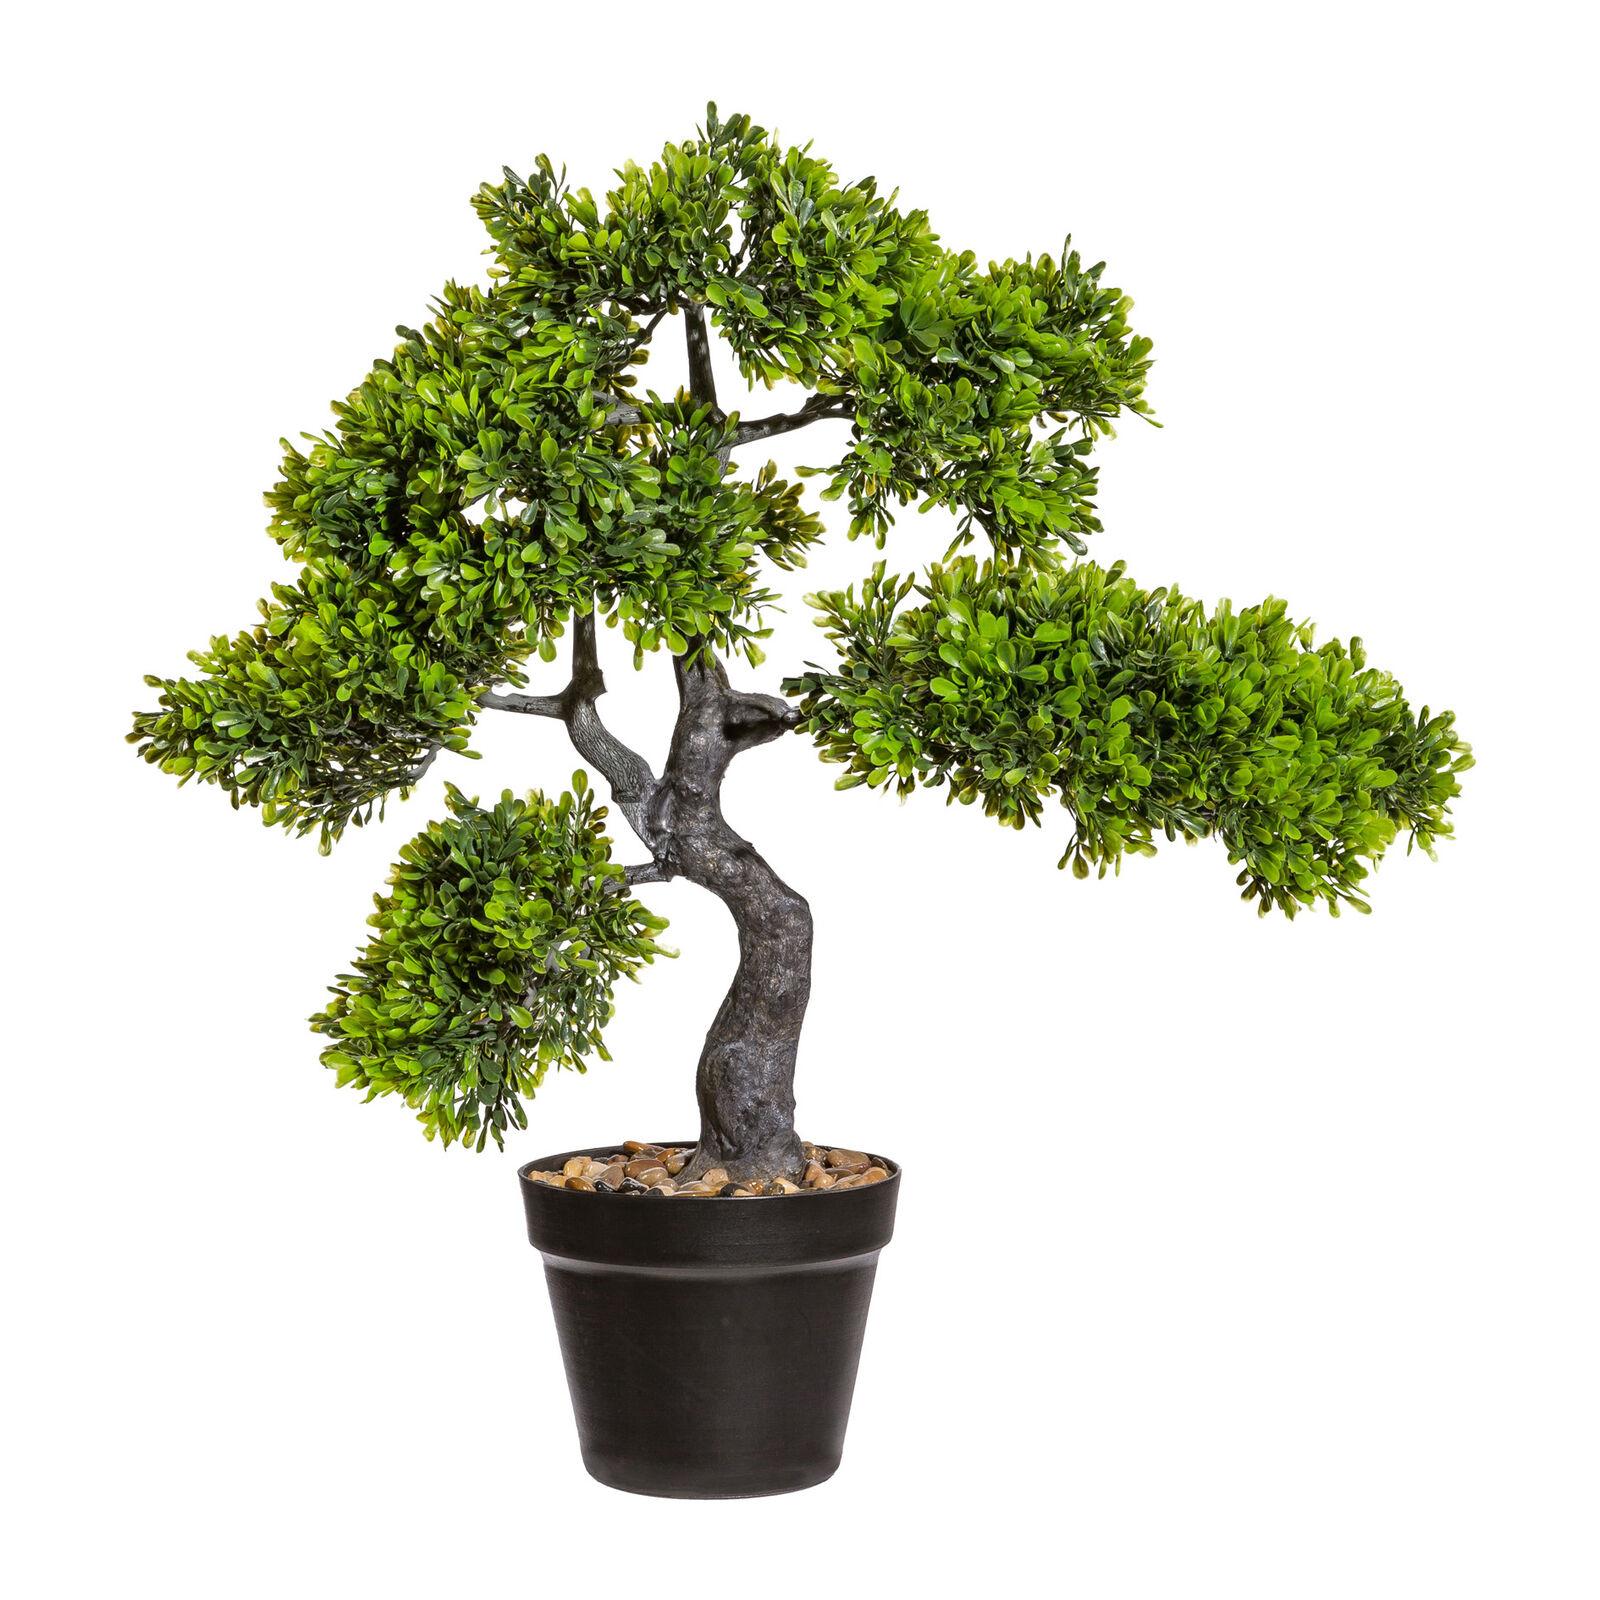 Kunstpflanze Bonsai Teeblatt grün, mit schwarzem Kunststoff-Topf, Höhe ca. 55 cm